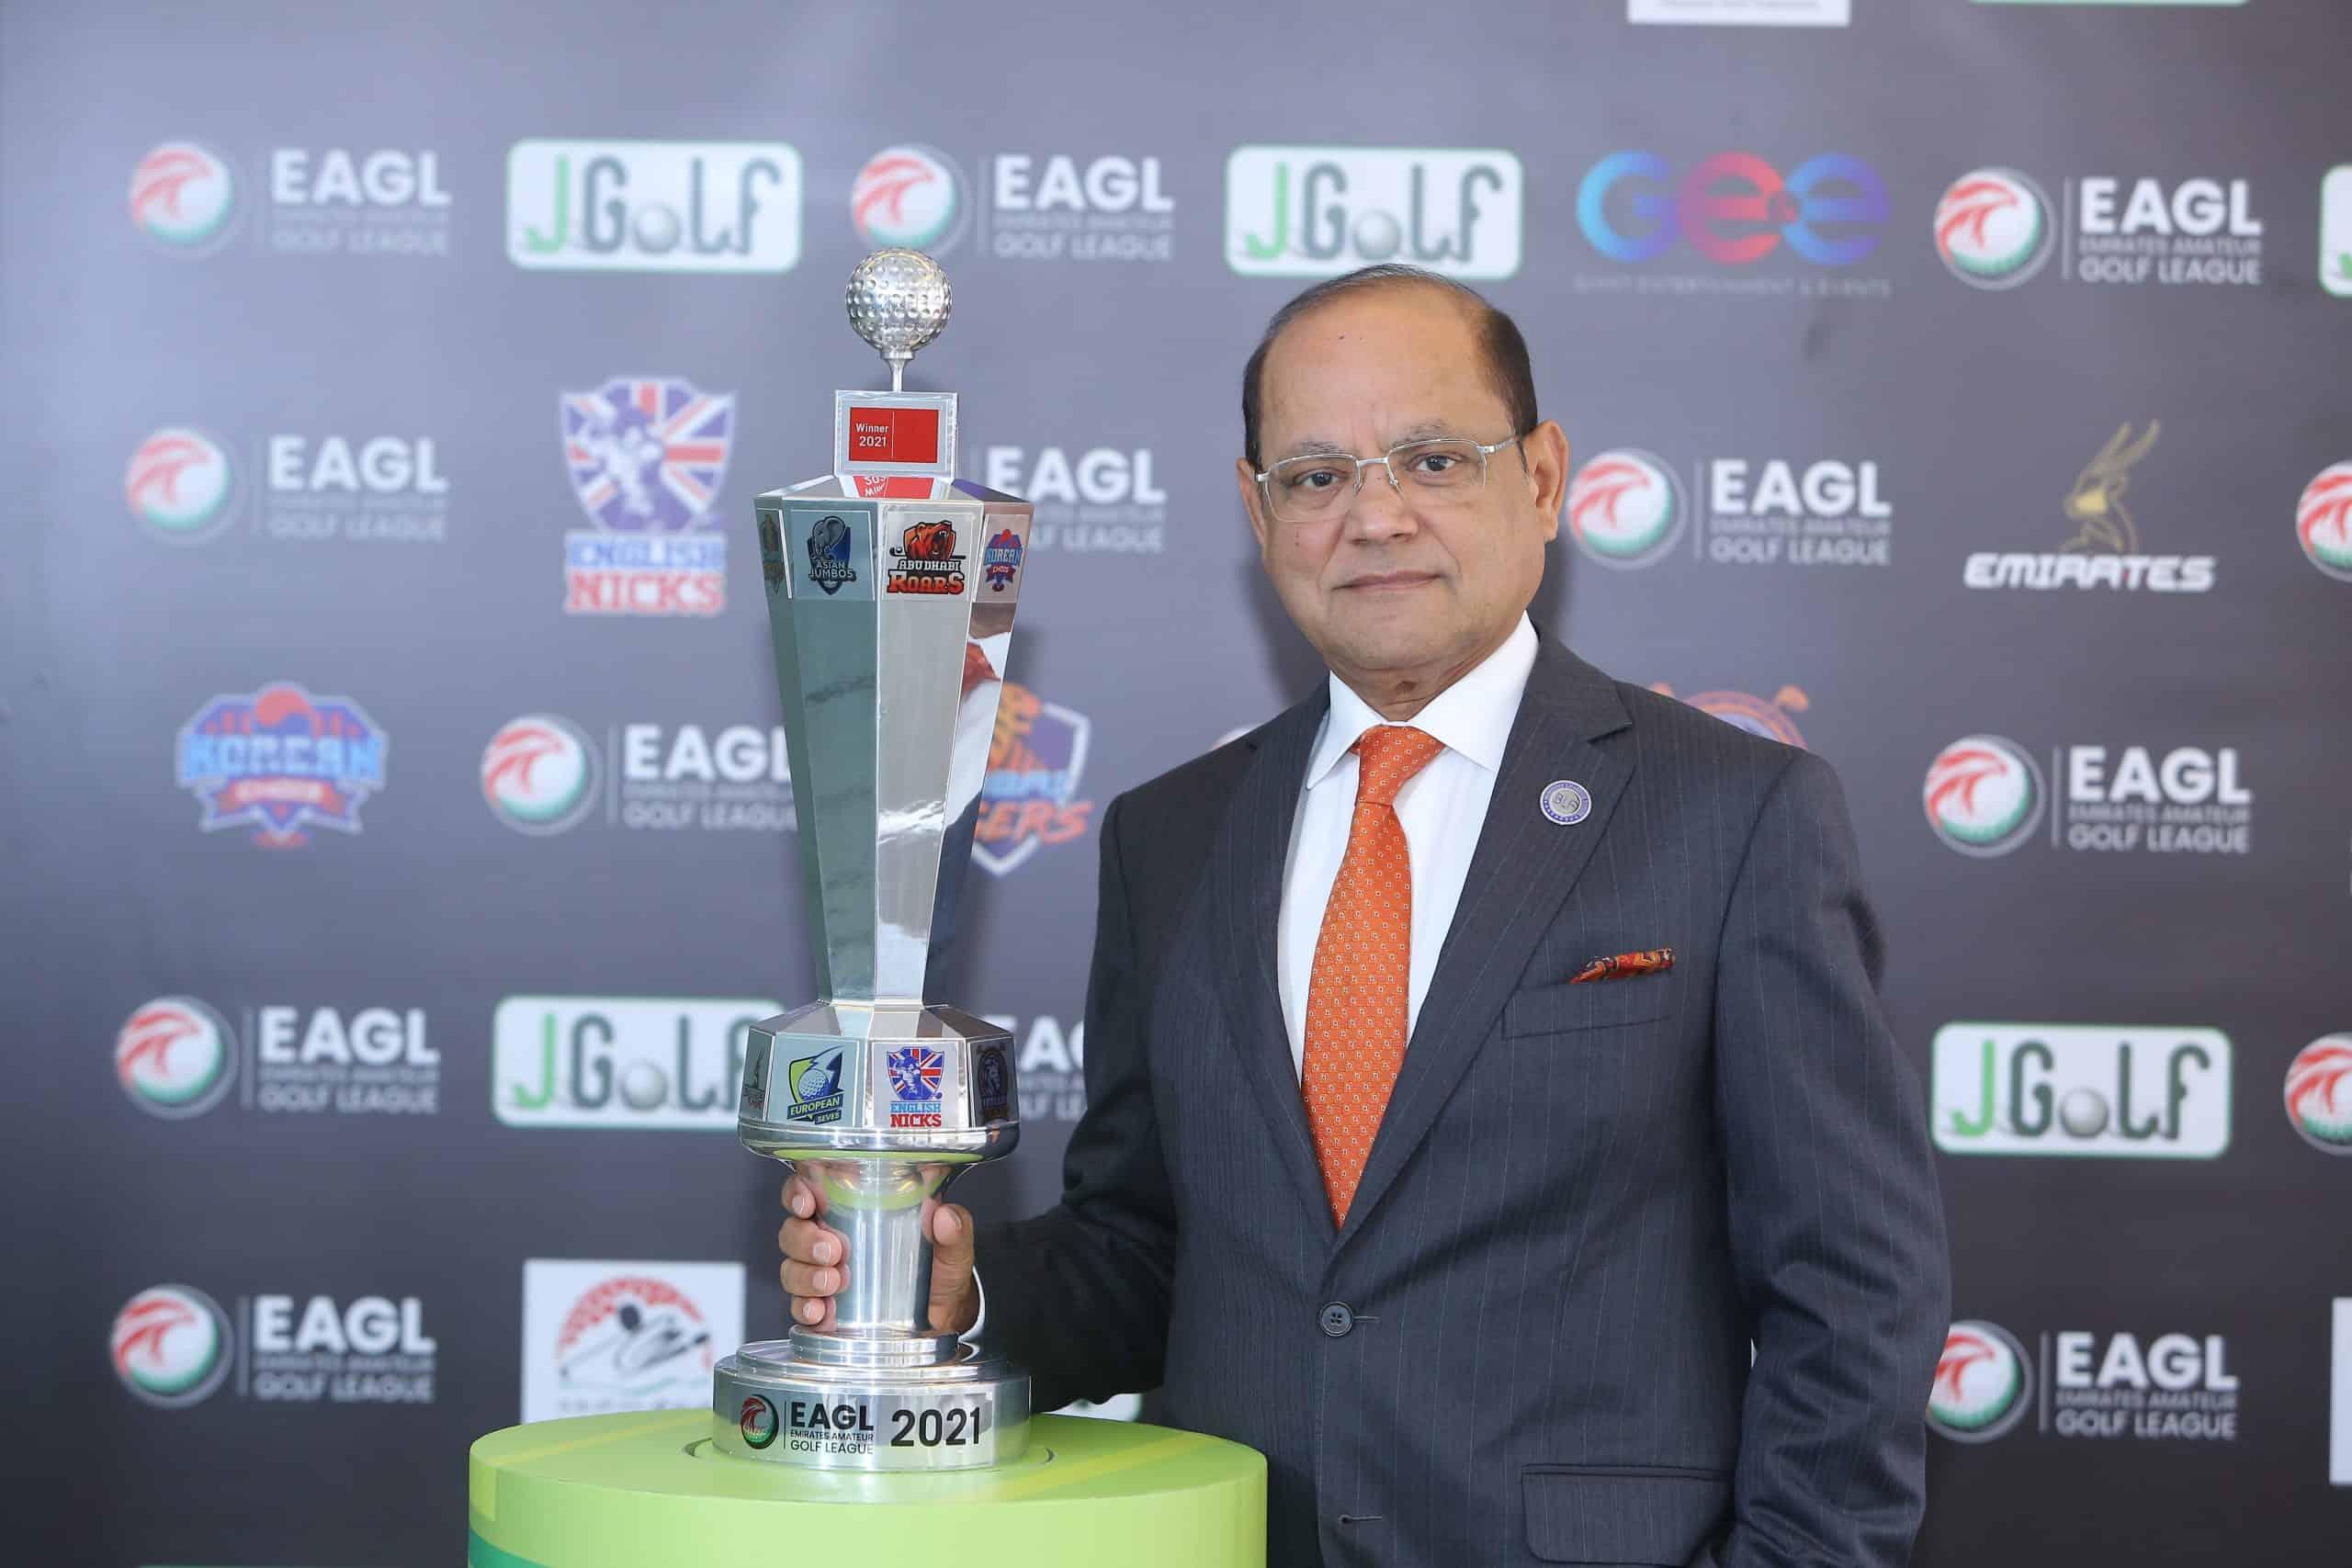 Emirates Amateur Golf League Dubai